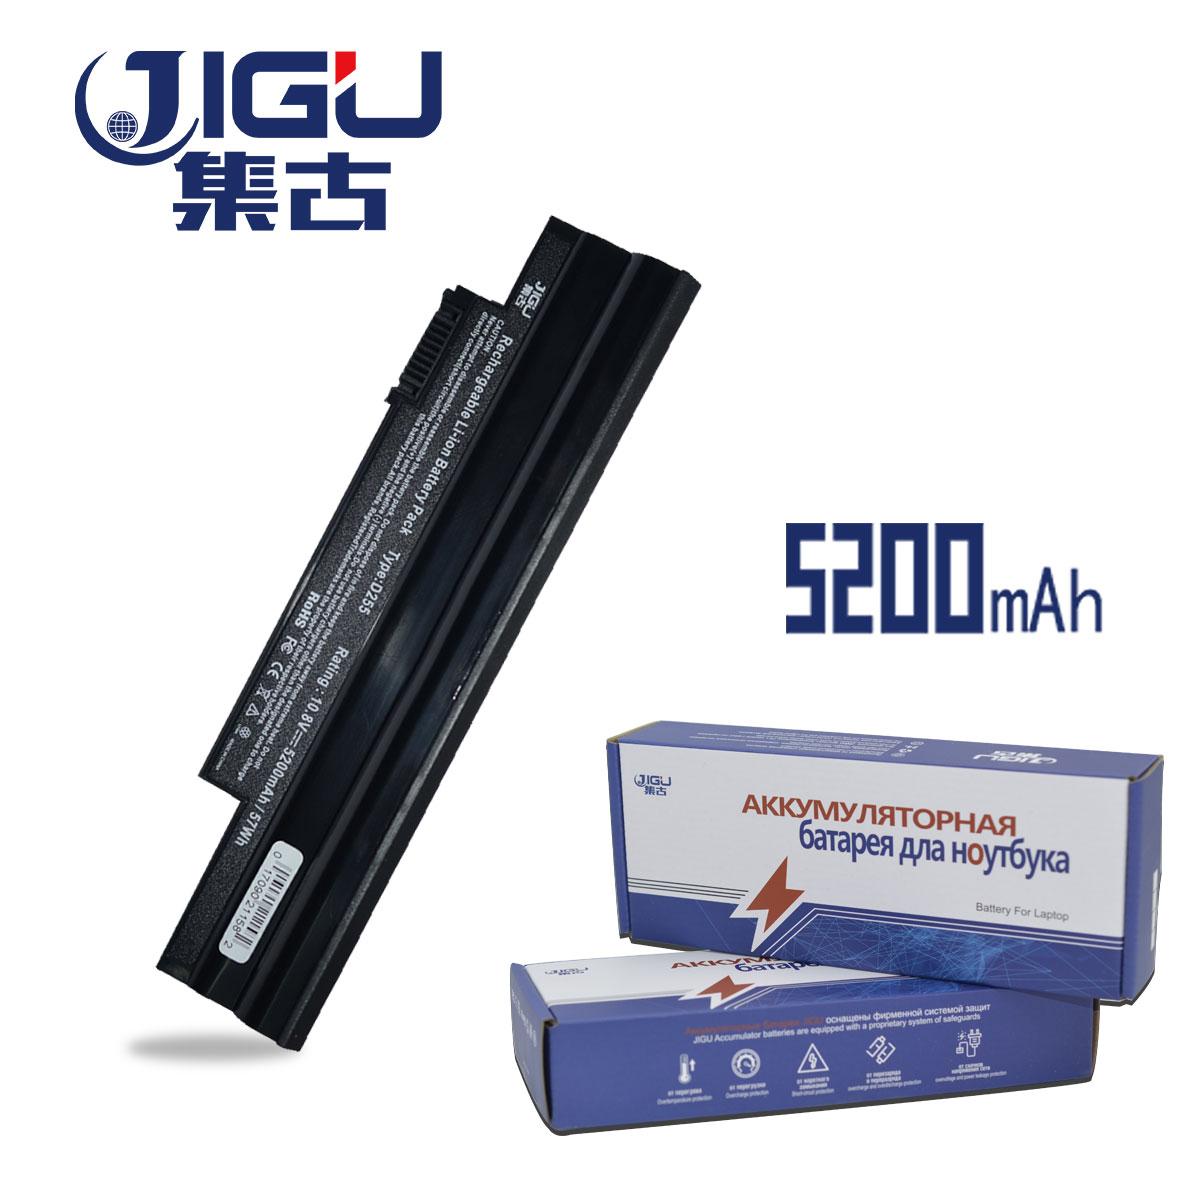 Baterai Acer Aspire One 722 D255 D257 D260 D270 Aod255 Al10a31 Happy 2 Putih Oem Jigu Battery For 522 Aod260 D255e D257e